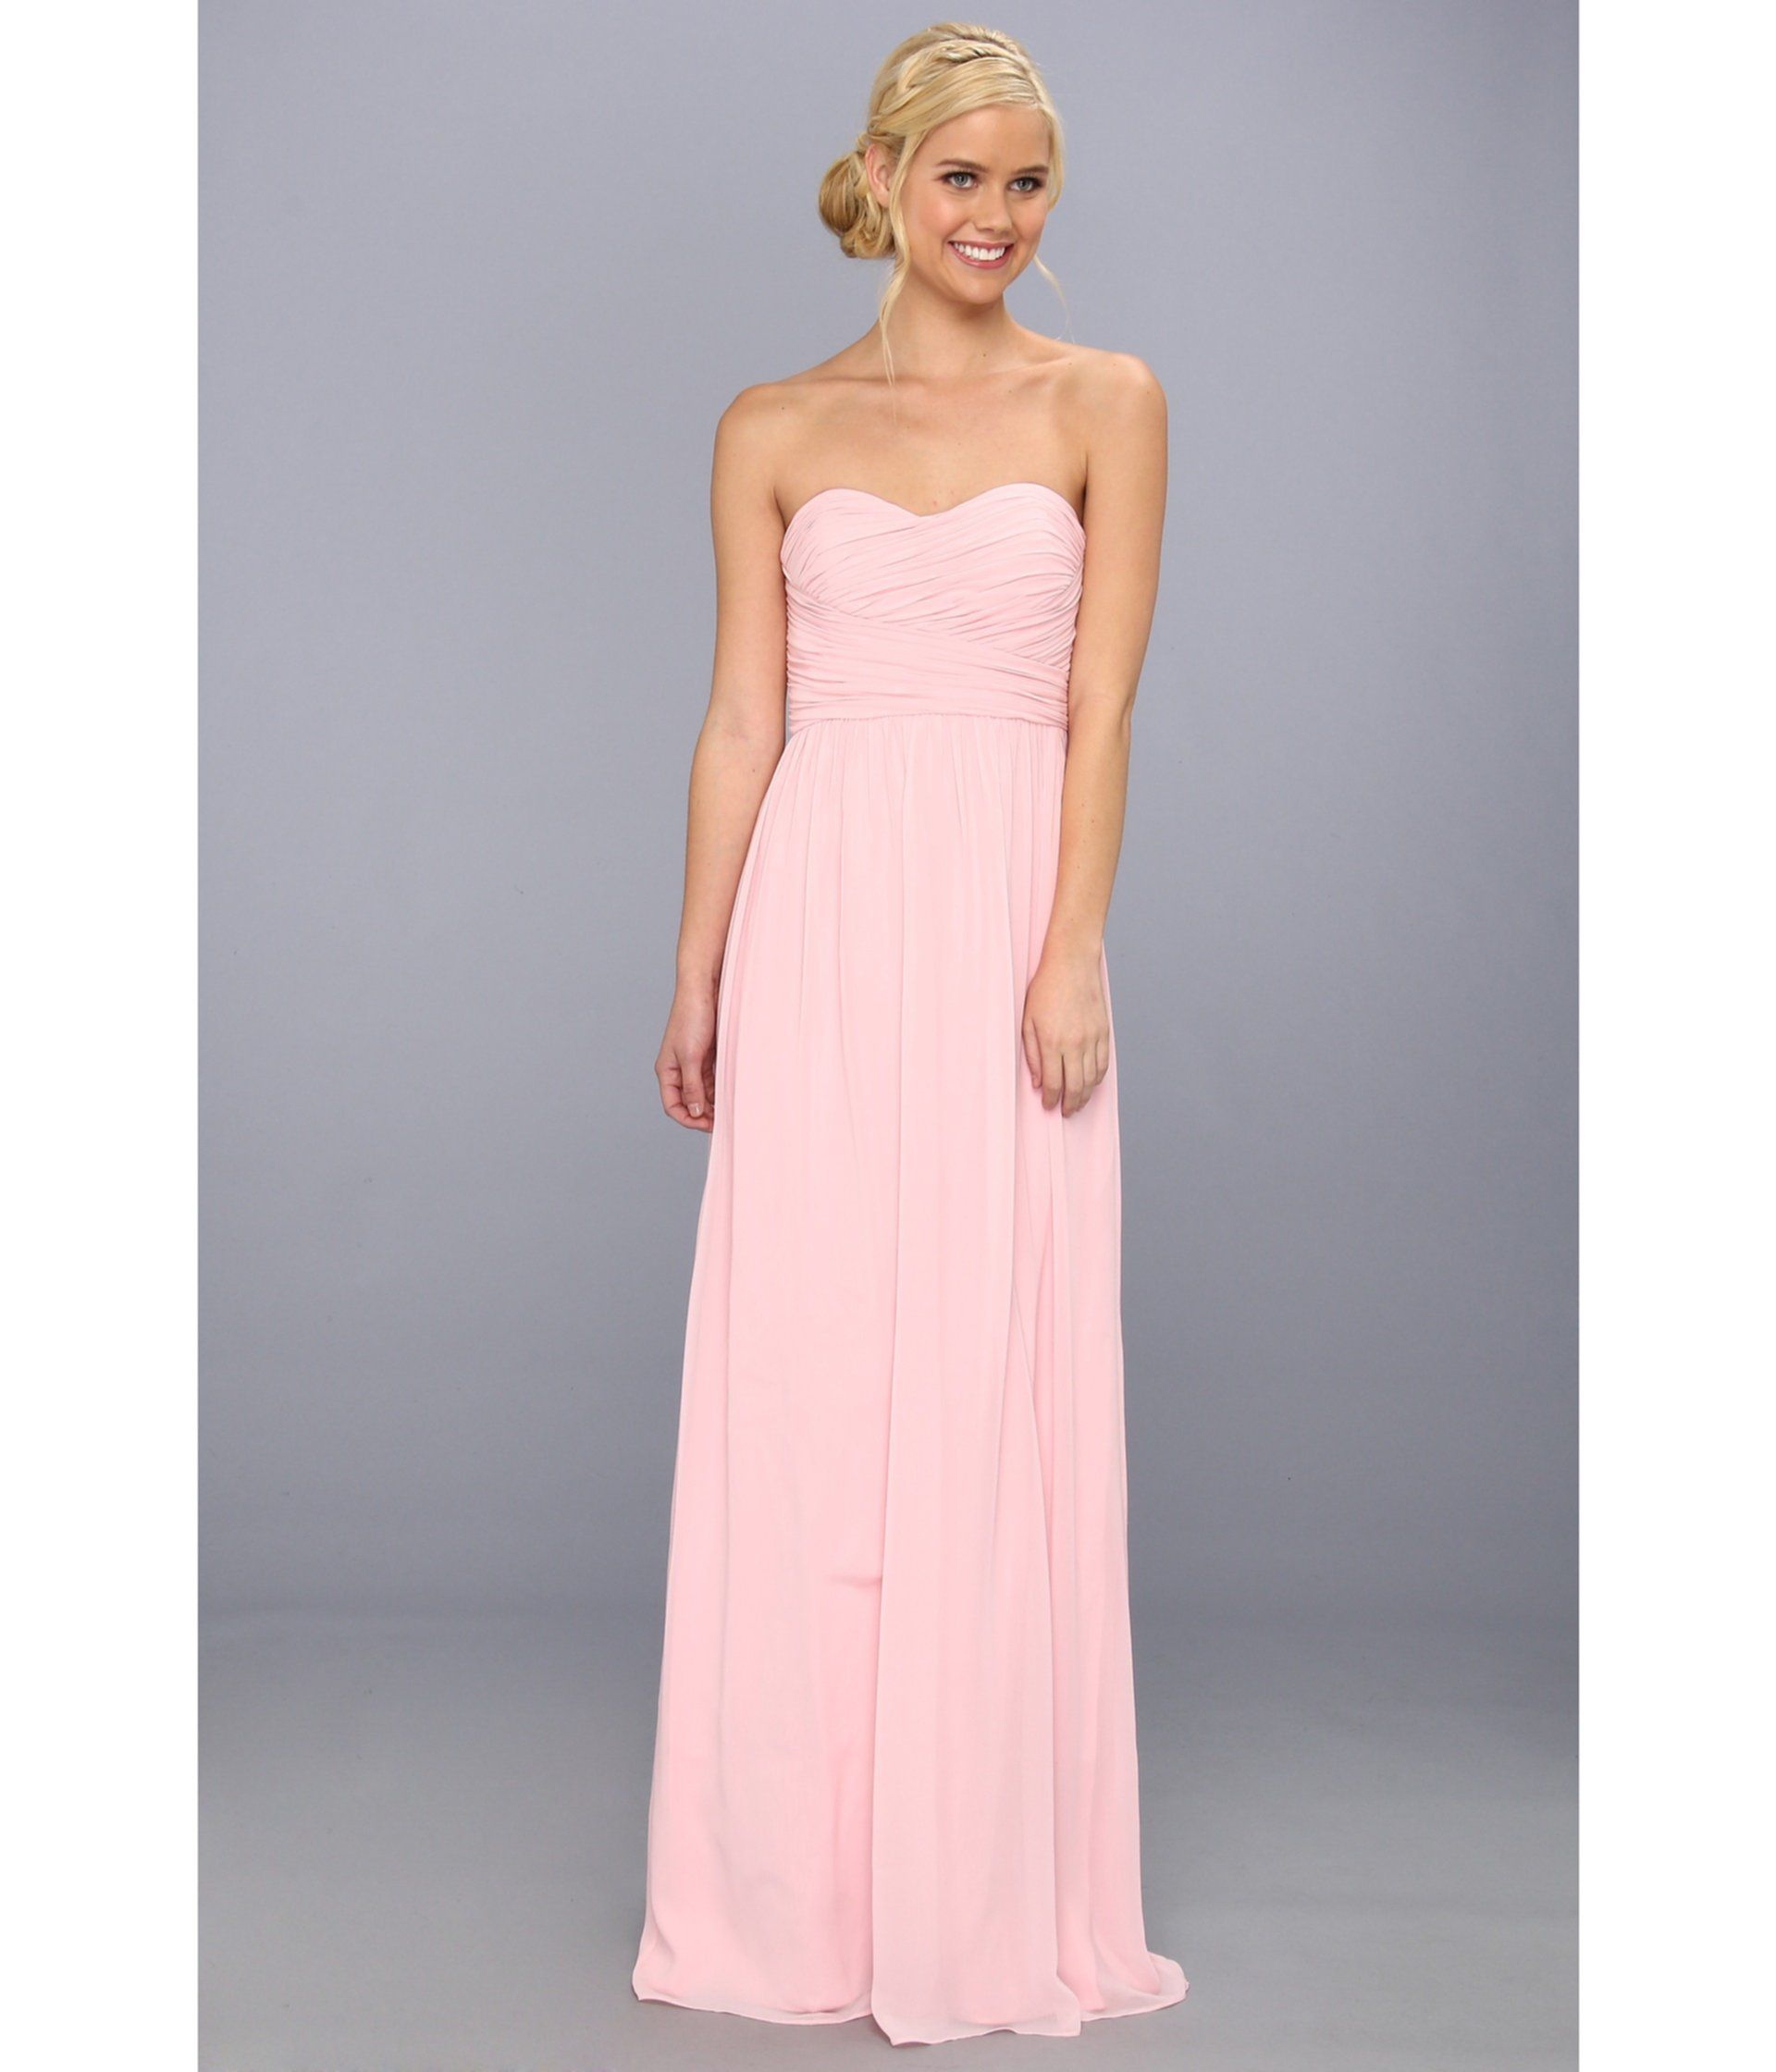 Rochie domnisoara de onoare roz pal | Rochii Elegante | Pinterest